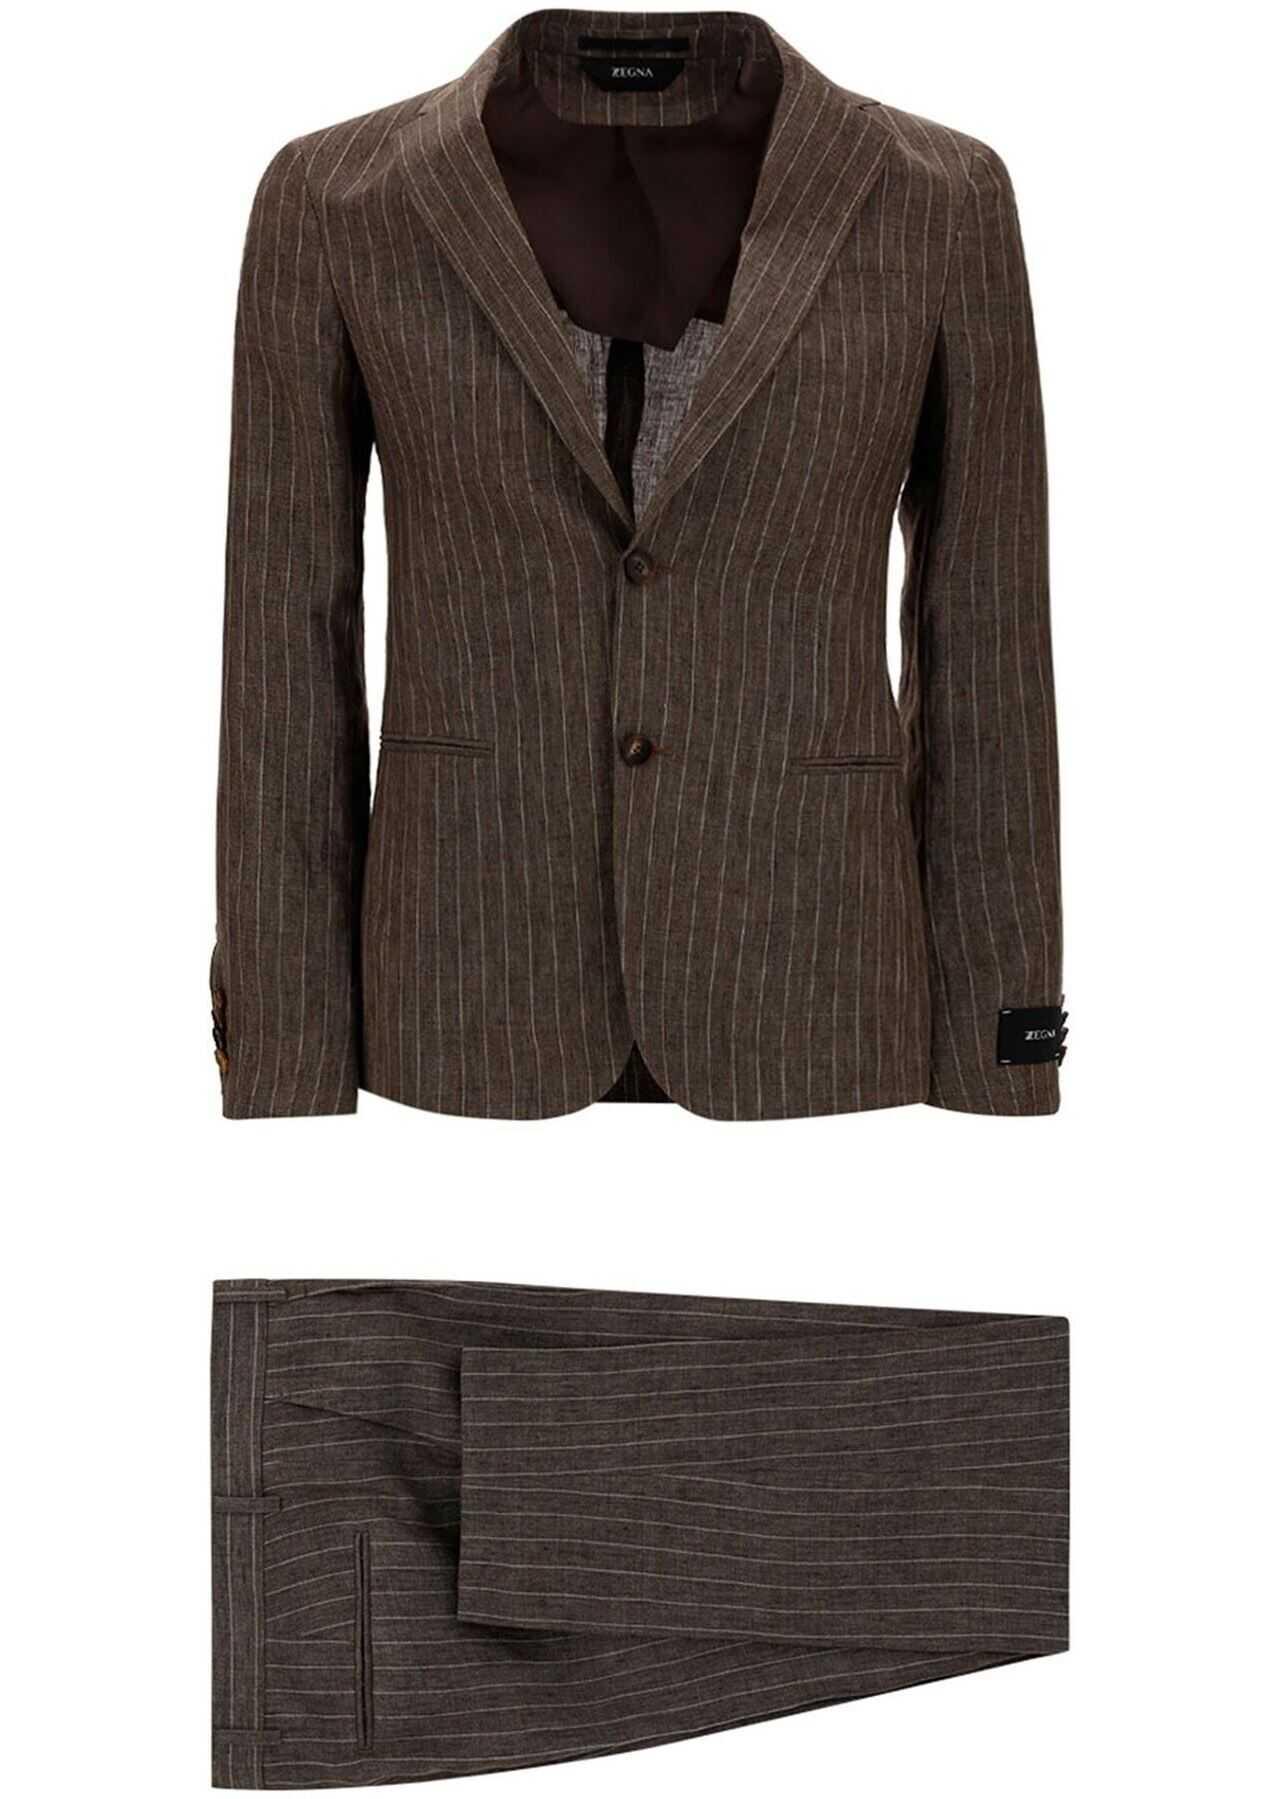 Z Zegna Pinstriped Linen Suit In Brown Brown imagine